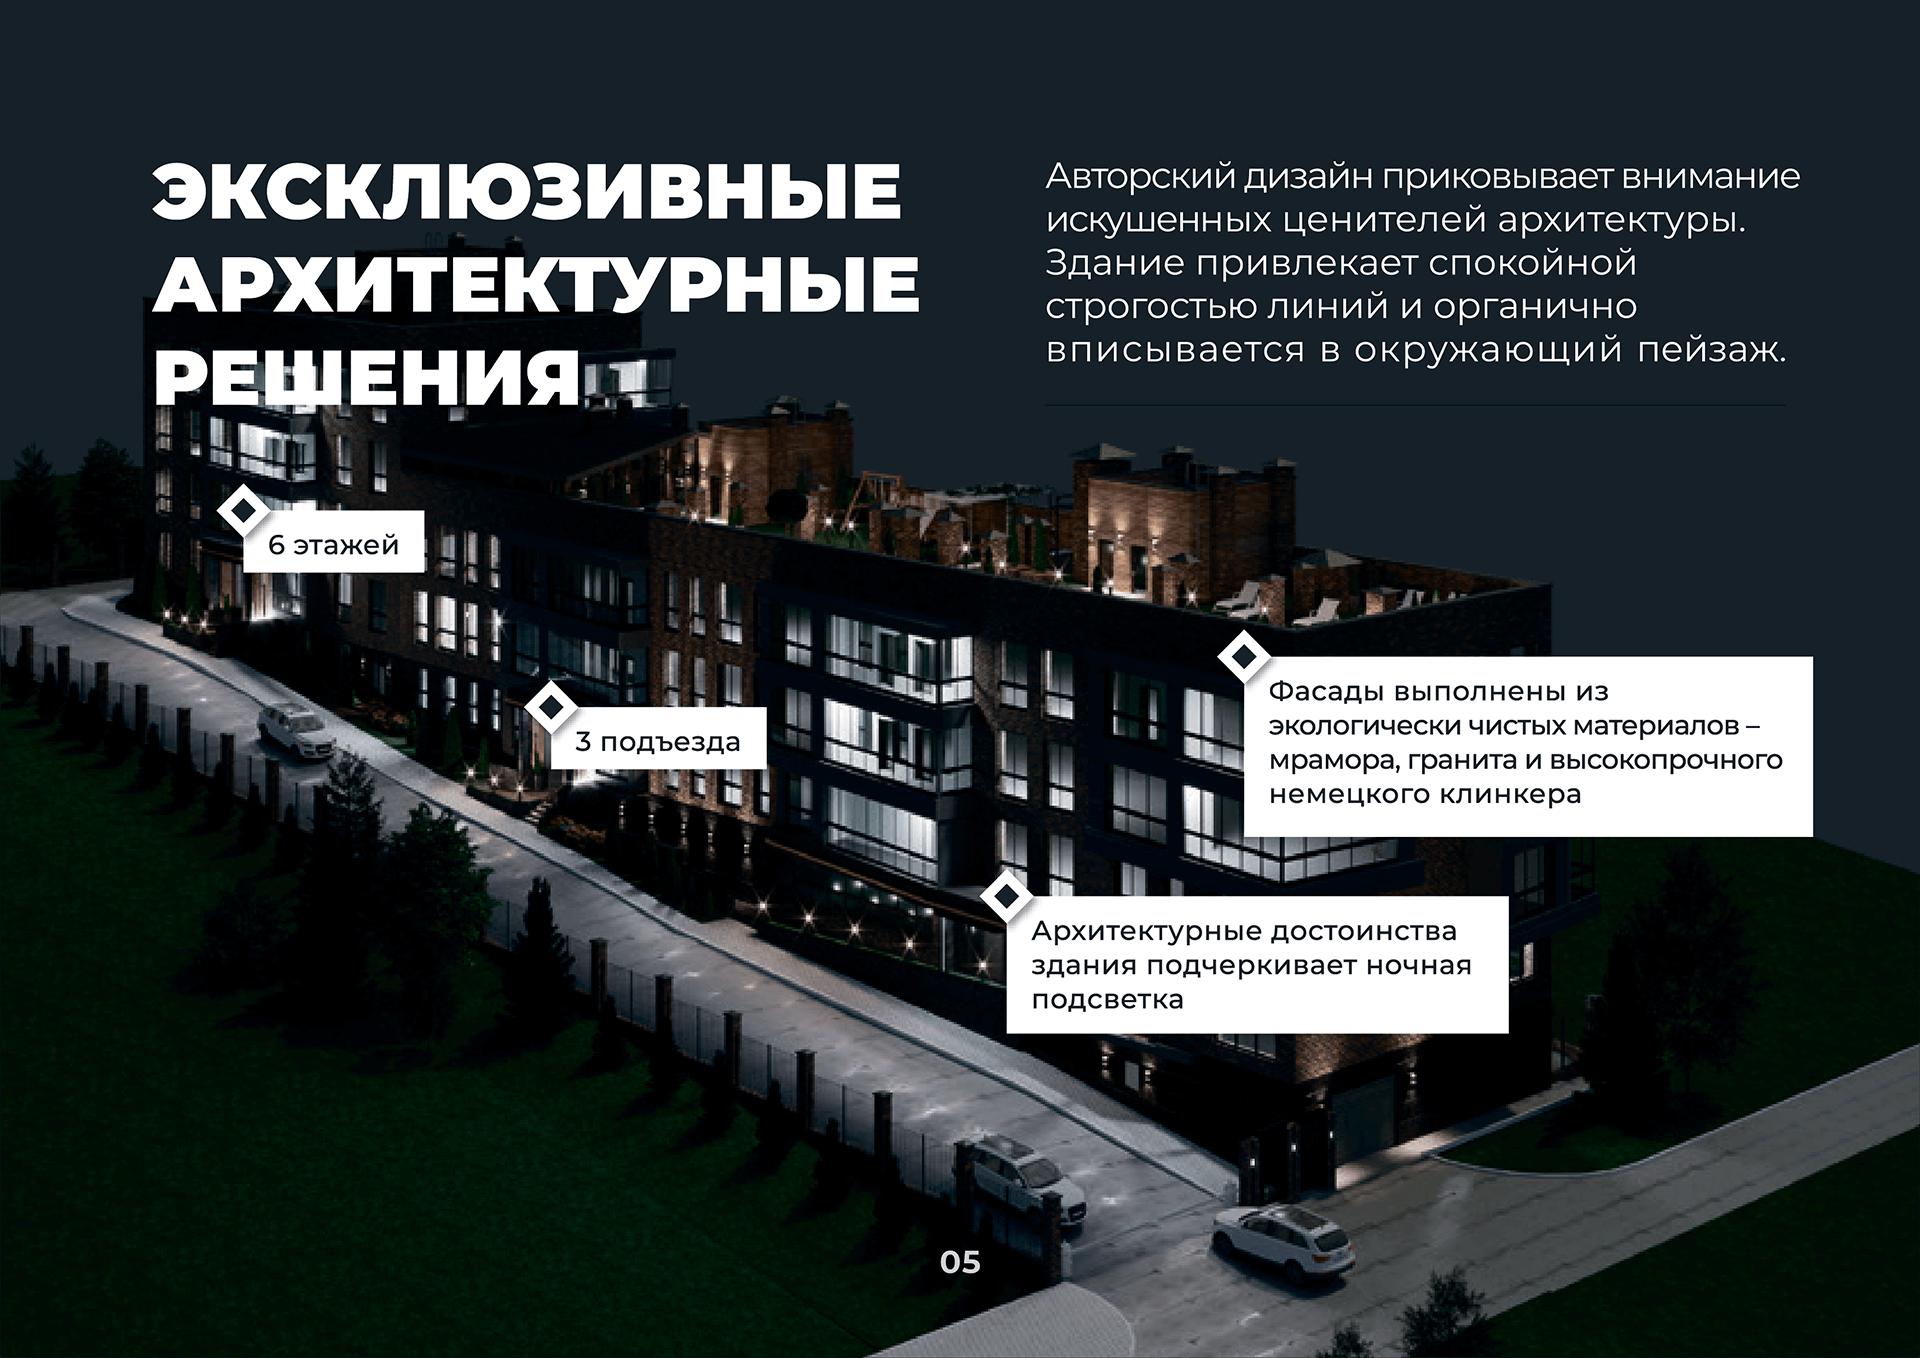 Презентация многоквартирного дома, жилого микрорайона, квартала